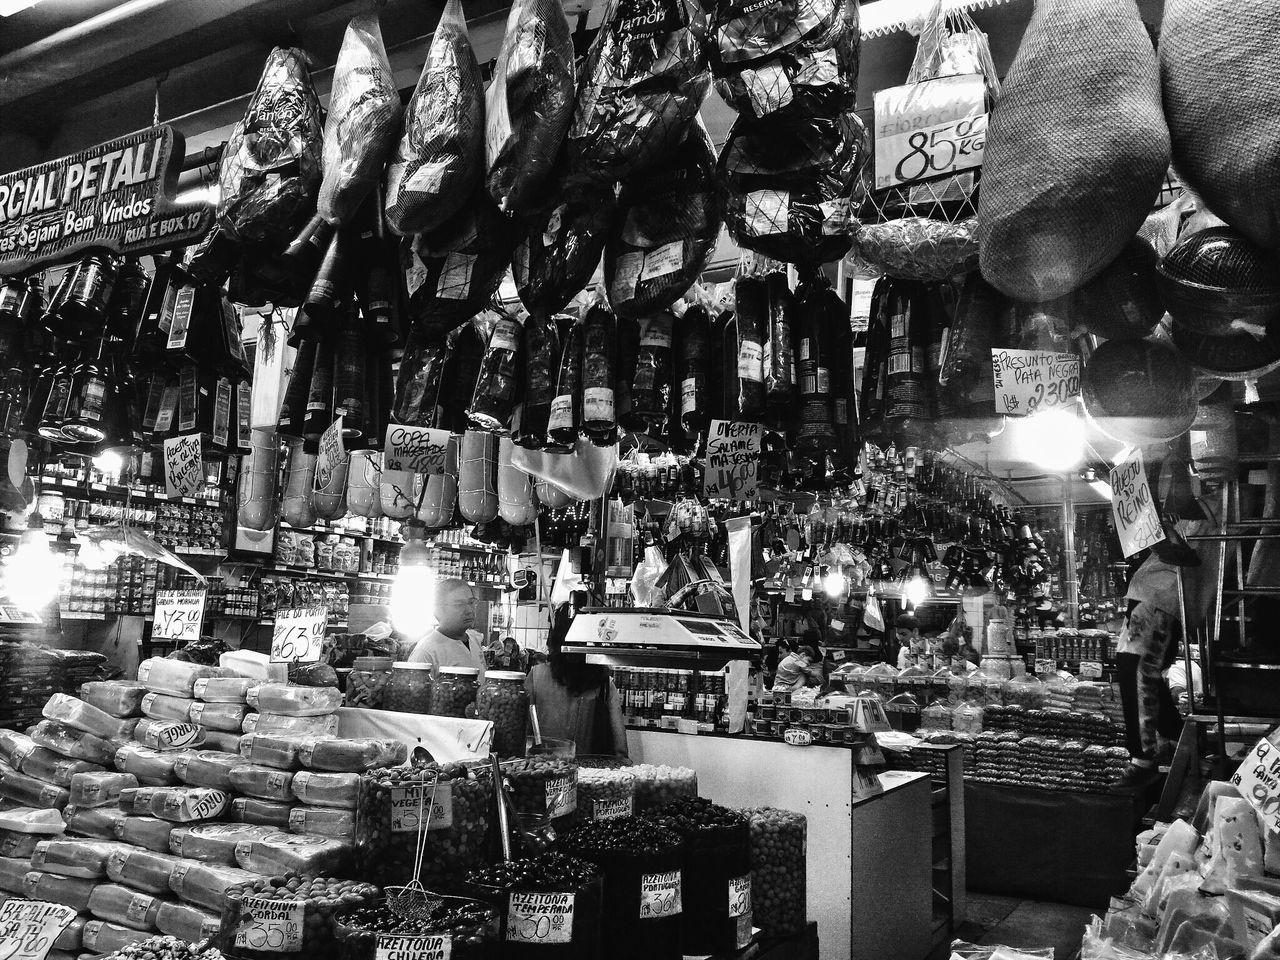 Sao Paulo - Brazil Saopaulo Mercadomunicipal Mercadao Mercadaosp Jamon JamonSerrano Jamoniberico Food Foodstore Blackandwhite People People Watching EyeEm Food Photography